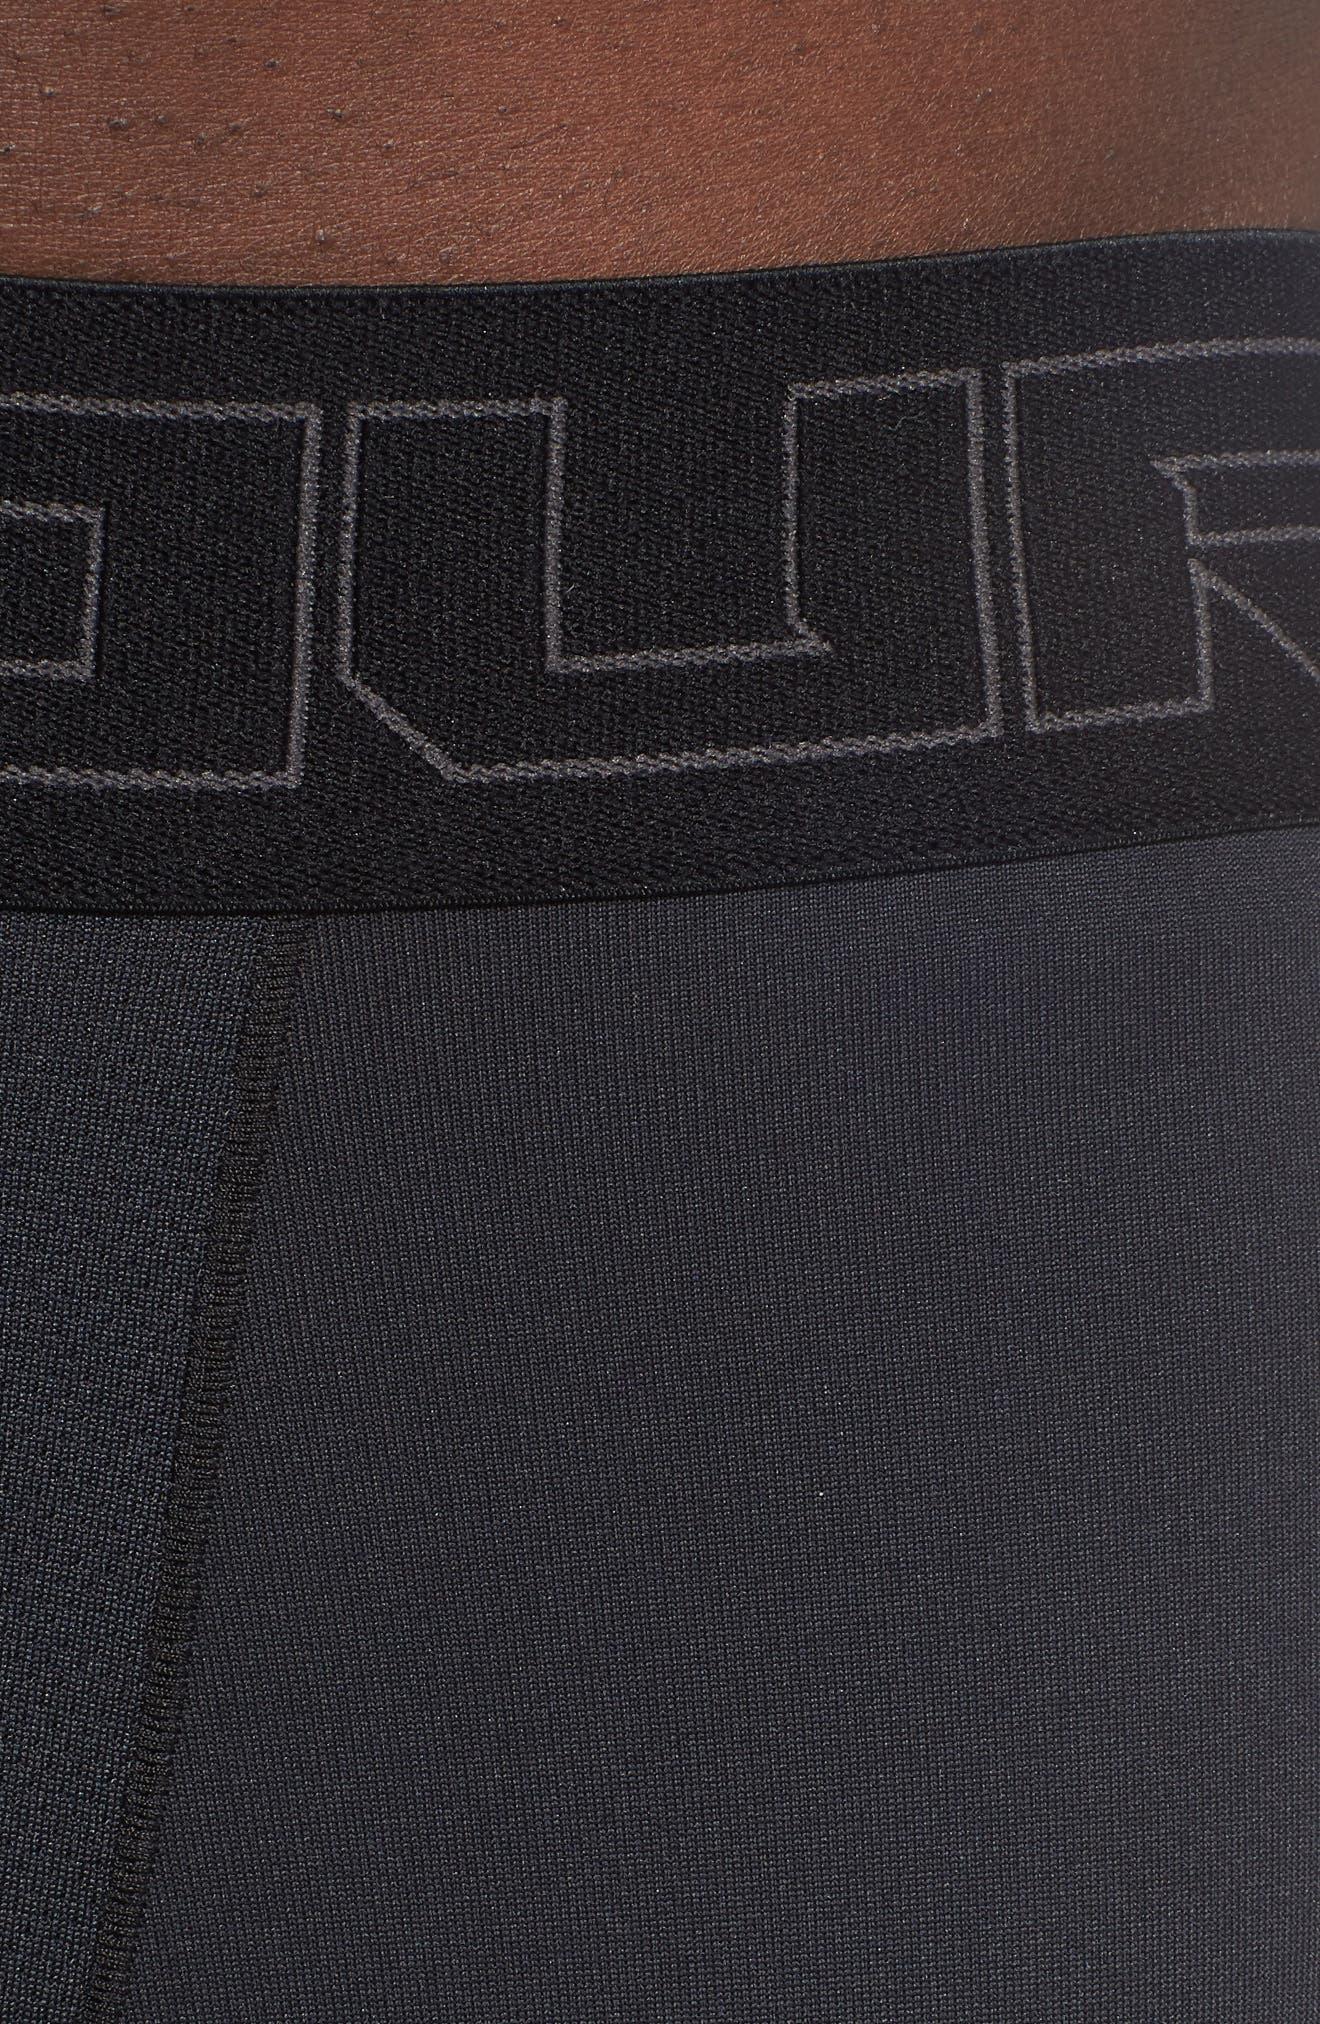 ColdGear<sup>®</sup> Leggings,                             Alternate thumbnail 4, color,                             BLACK/ CHARCOAL